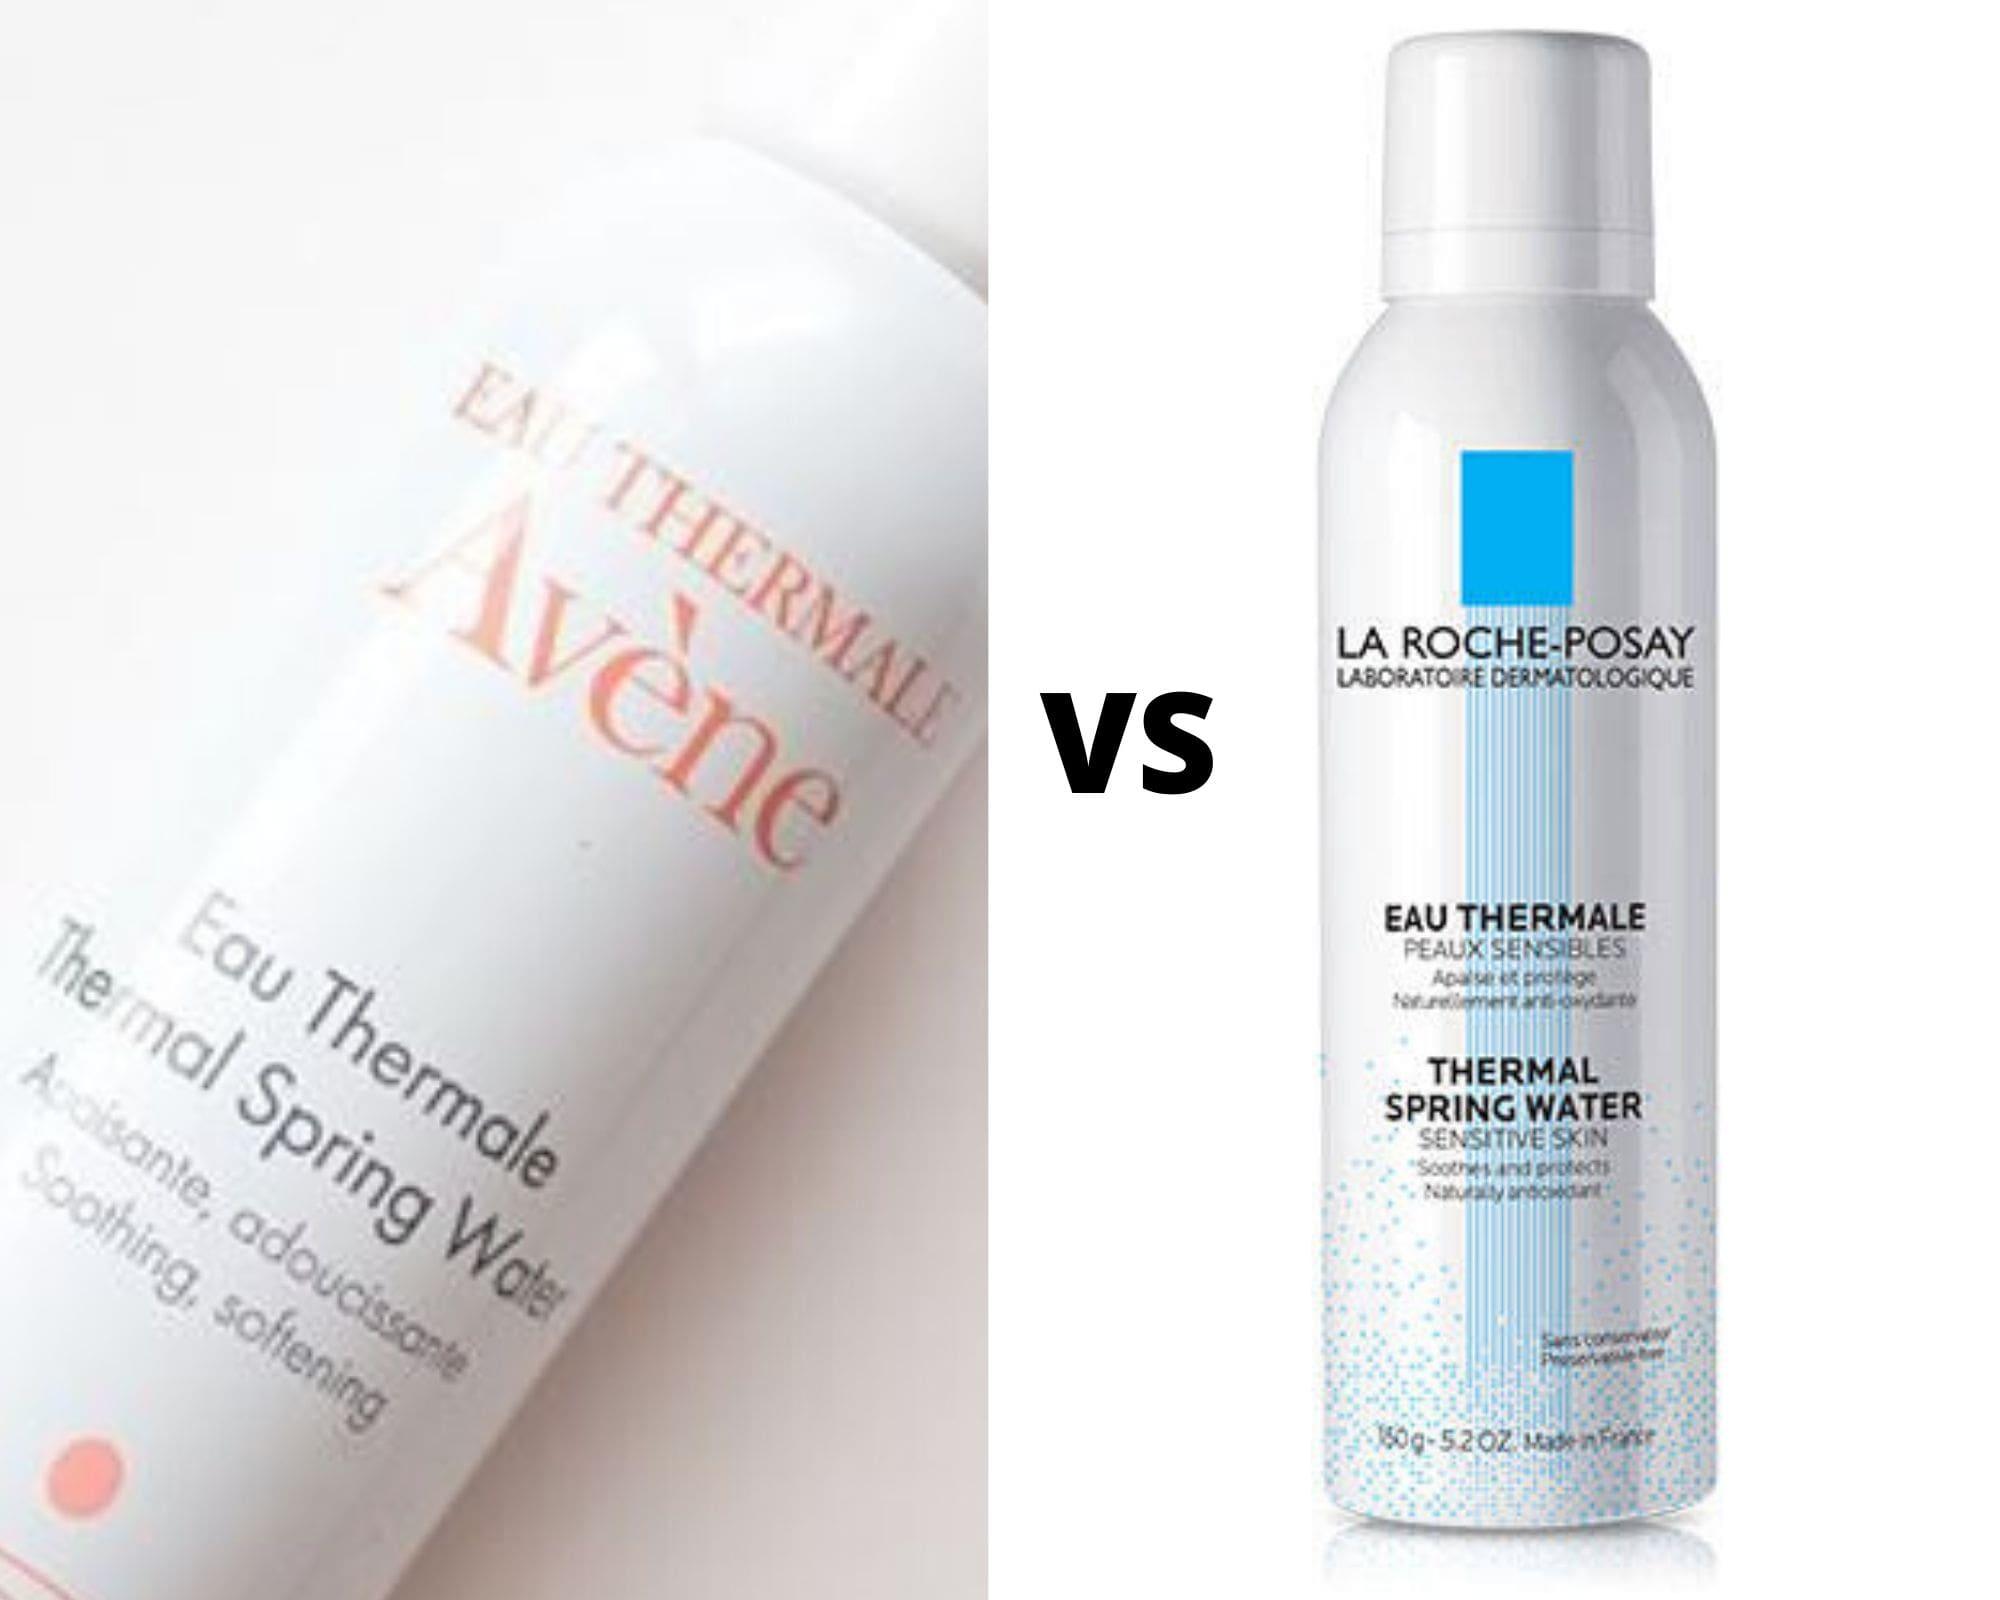 Avene or LA Roche-Posay Thermal Water